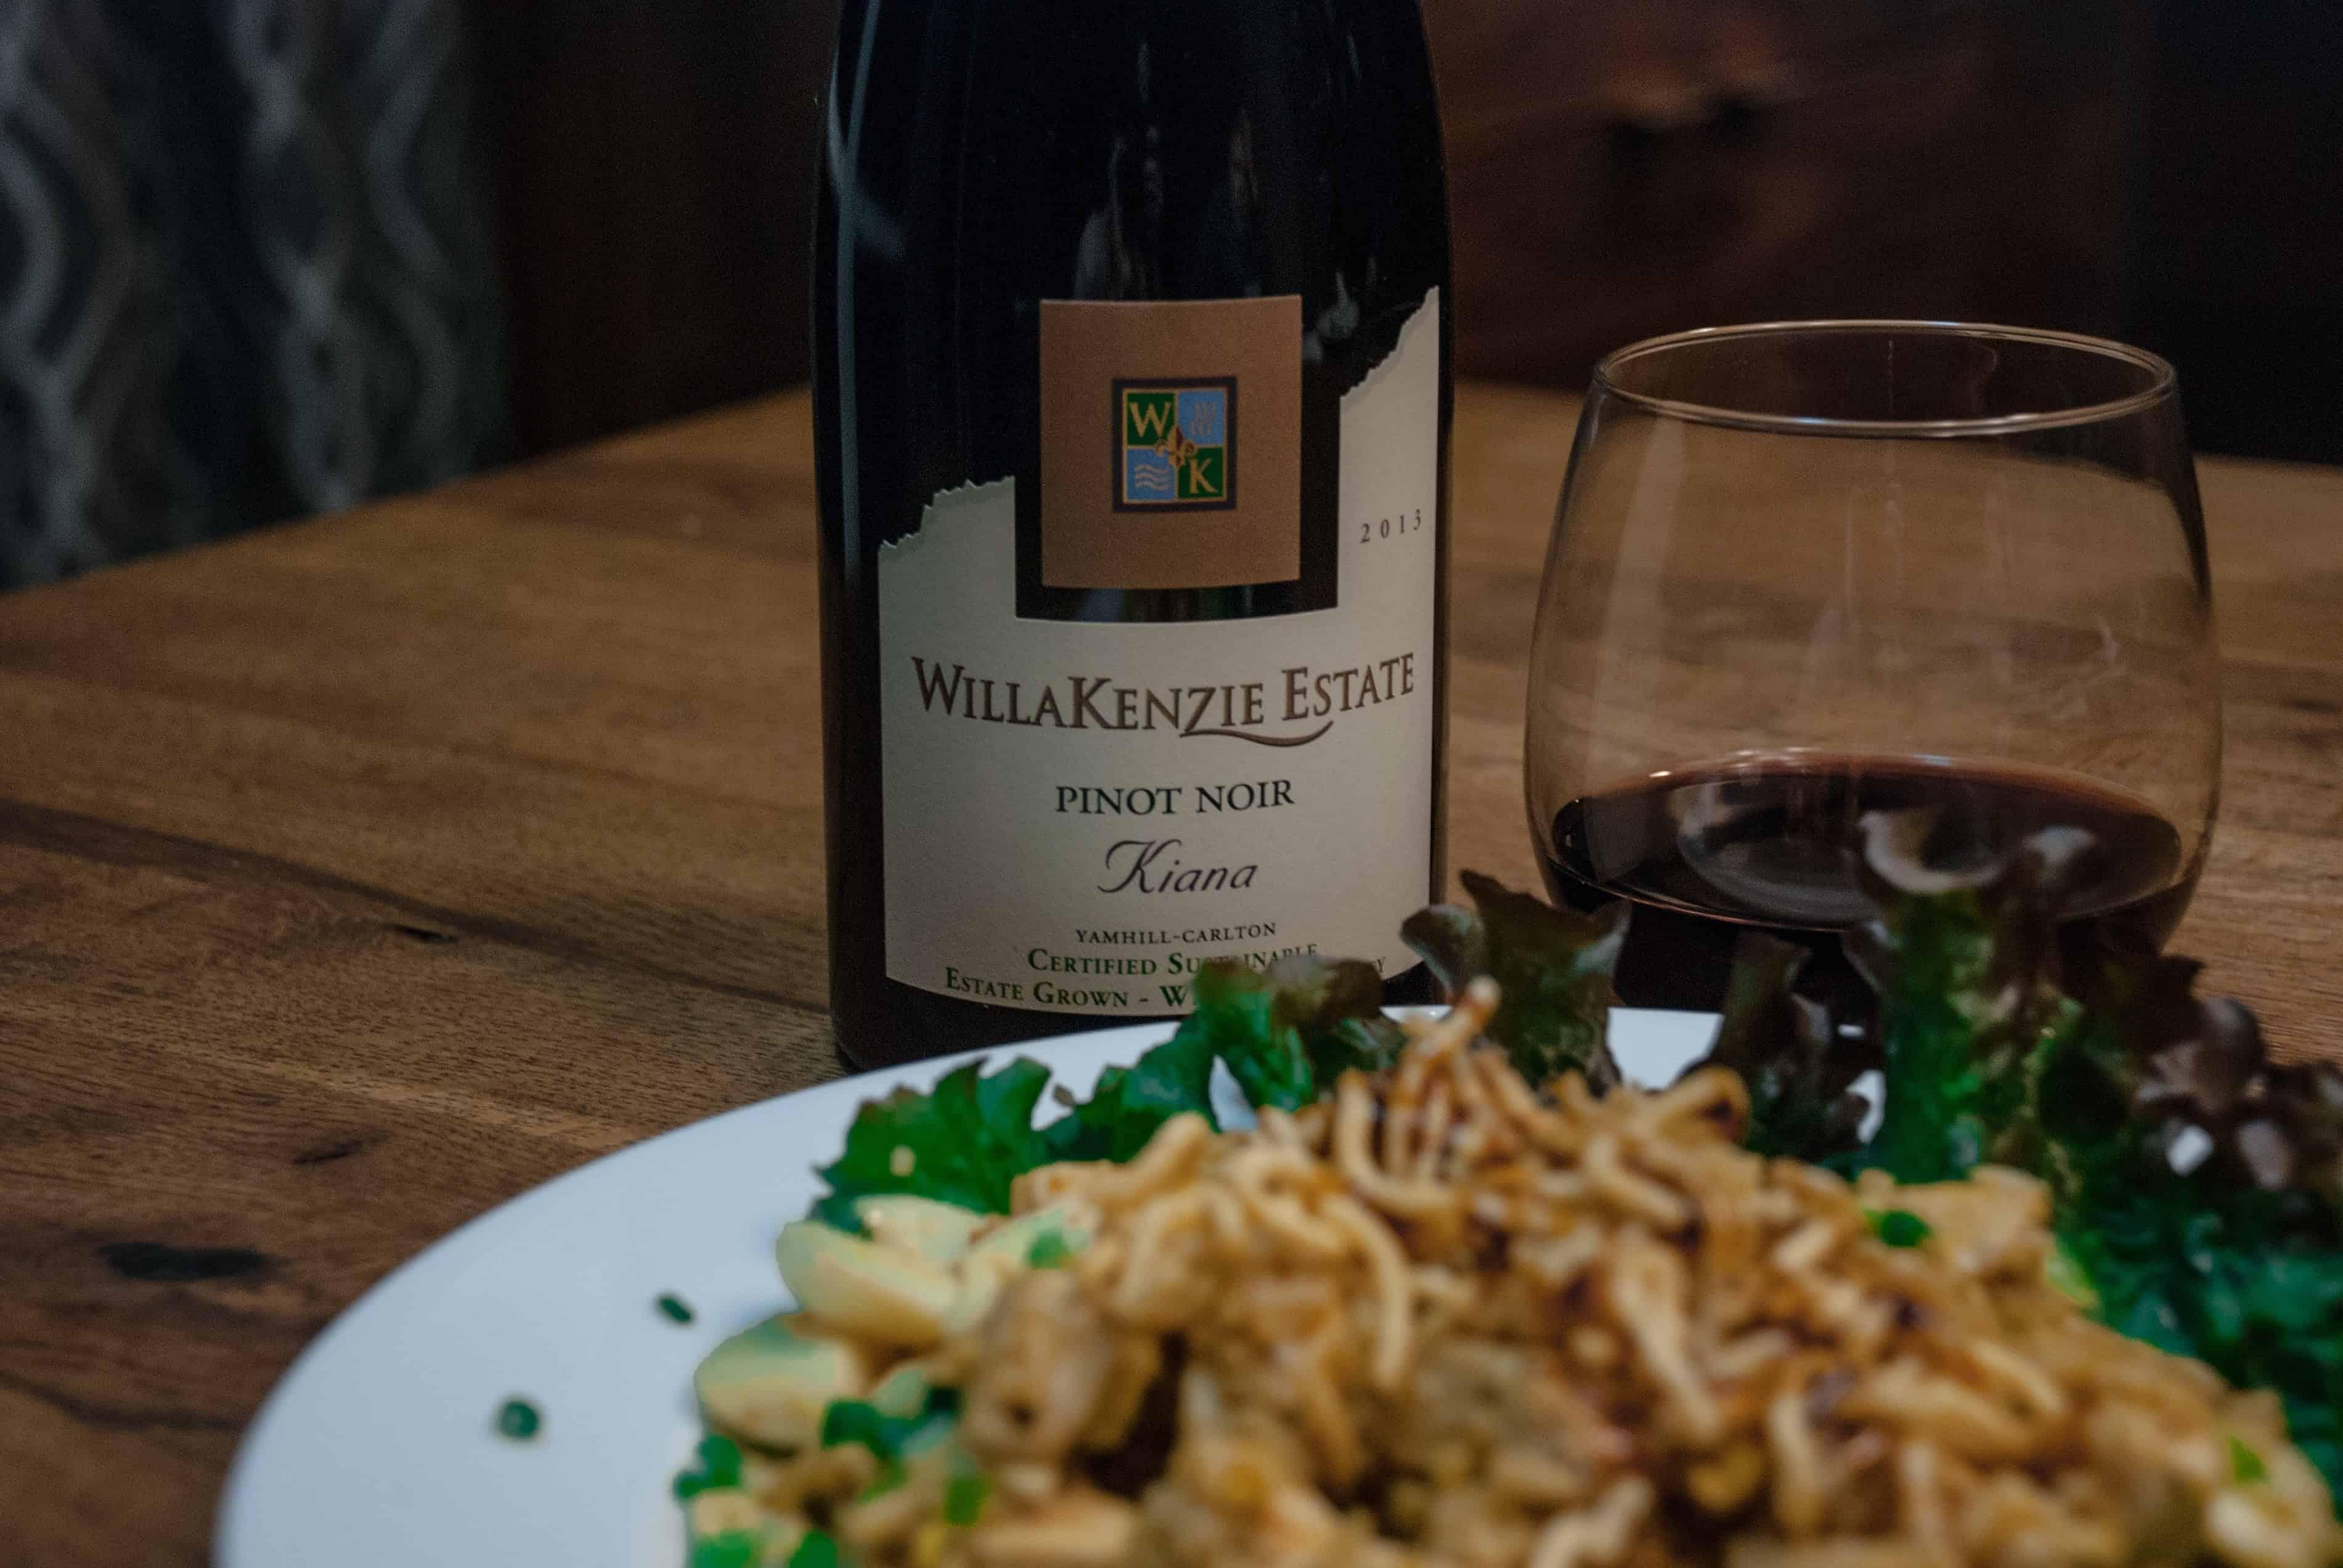 Pinot Noir food pairing allows plenty of creativity.